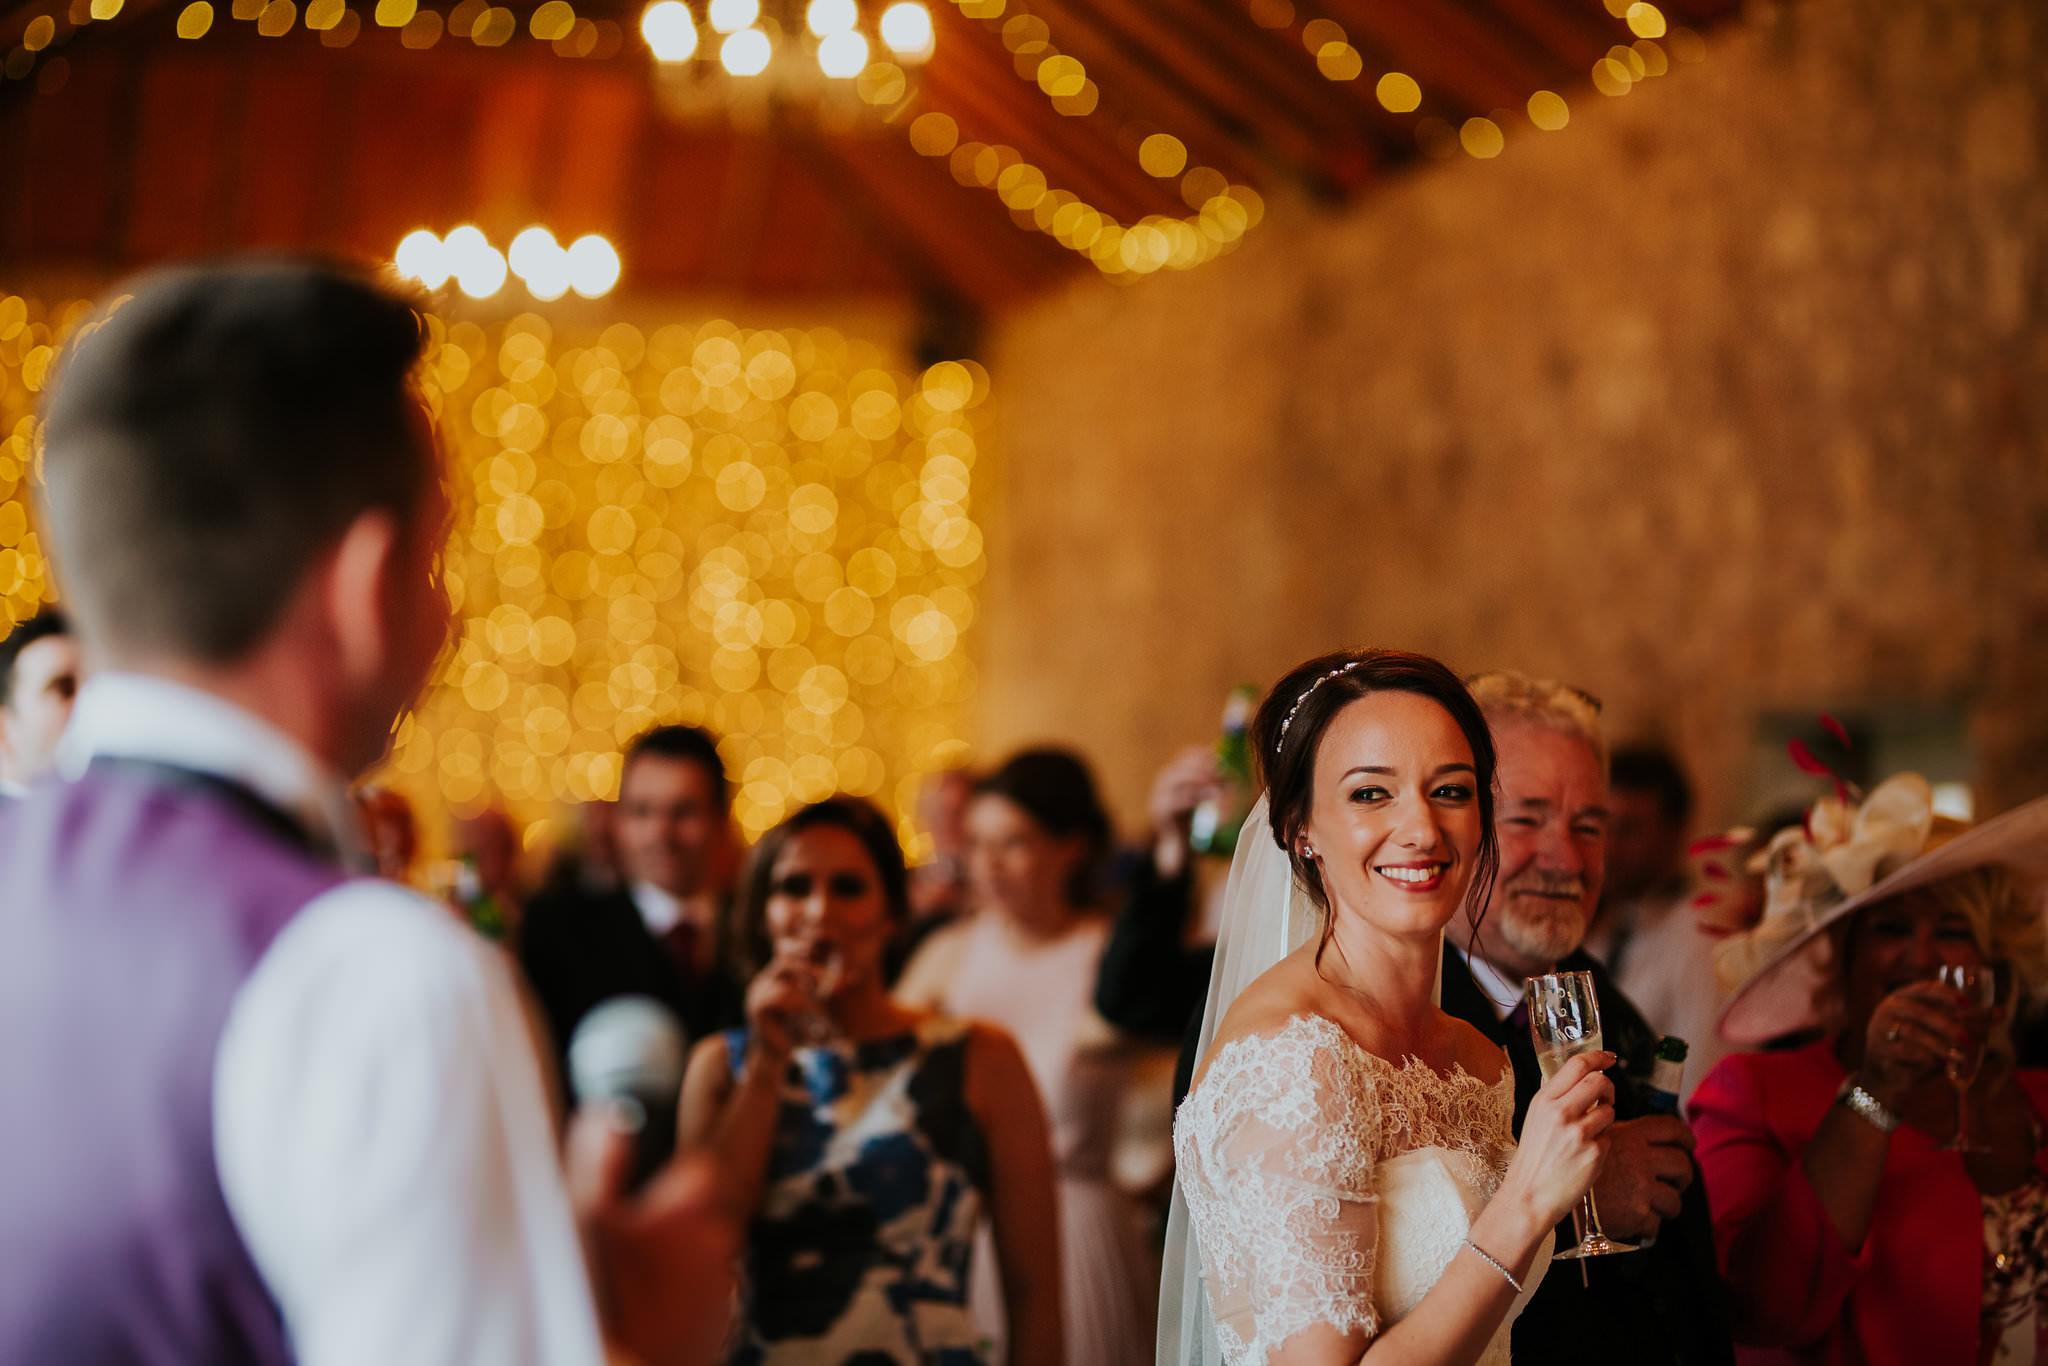 kirknewton stables wedding photographer (64).jpg